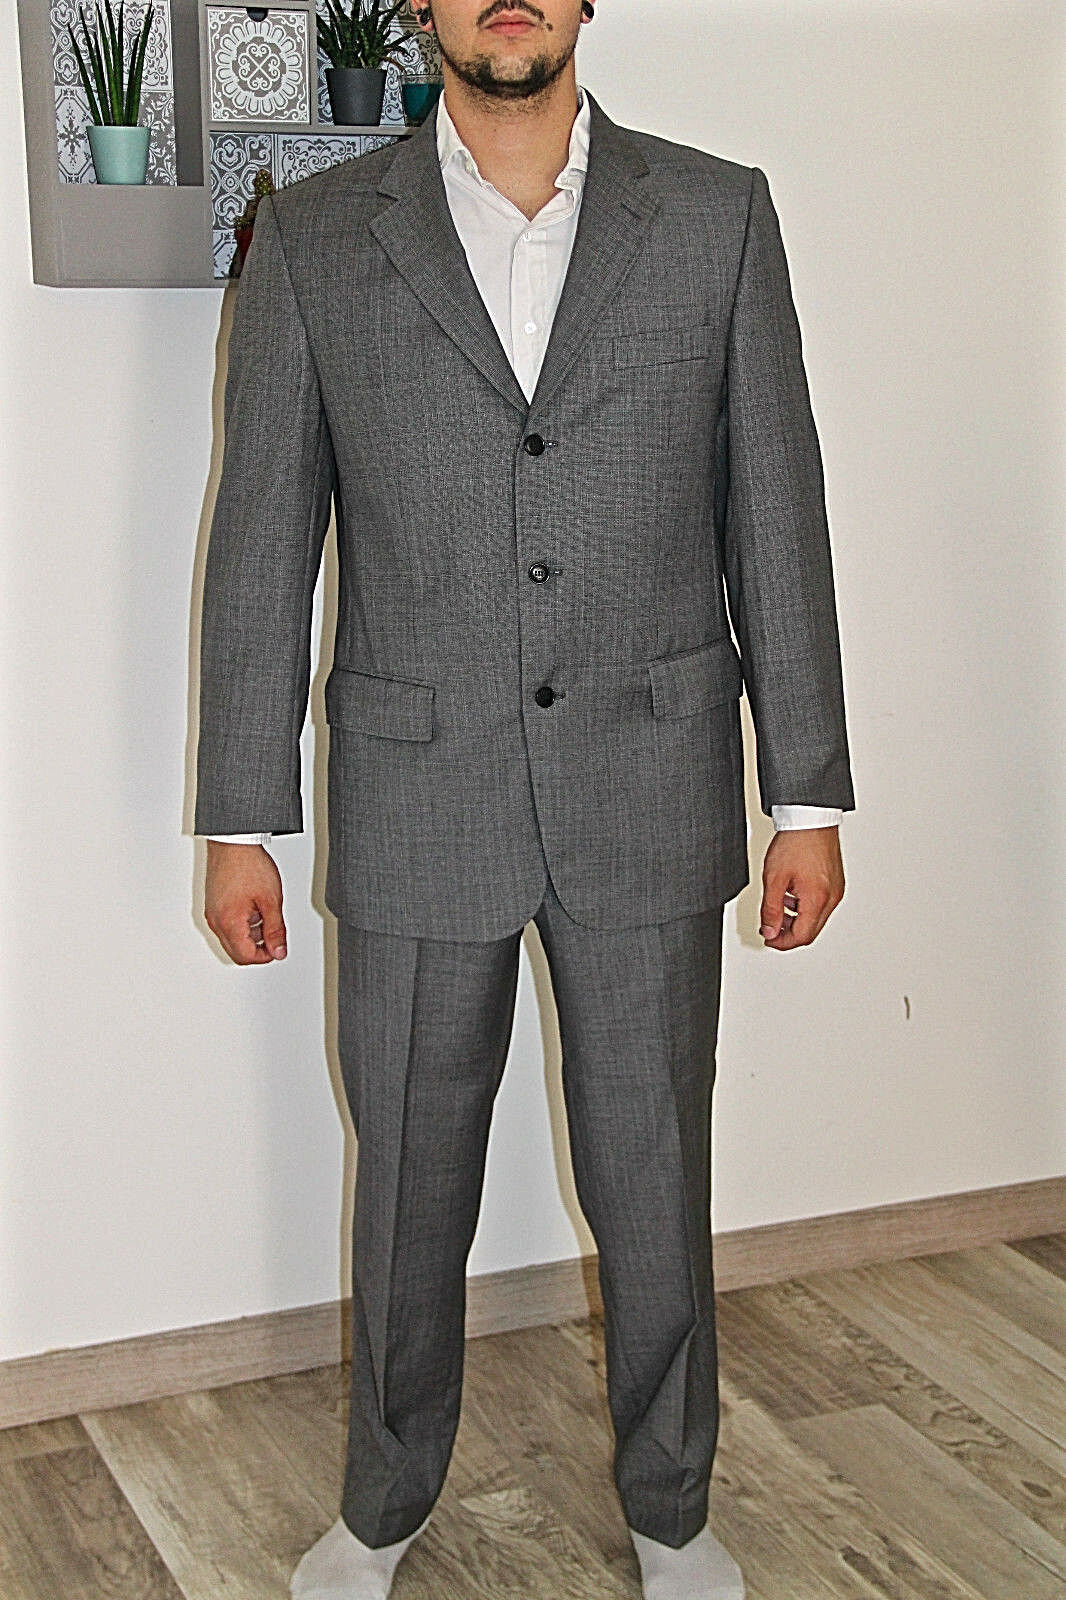 Abito grigio di lana SERGE BLANCO giacca T 52 pantaloni T 42/44 fr